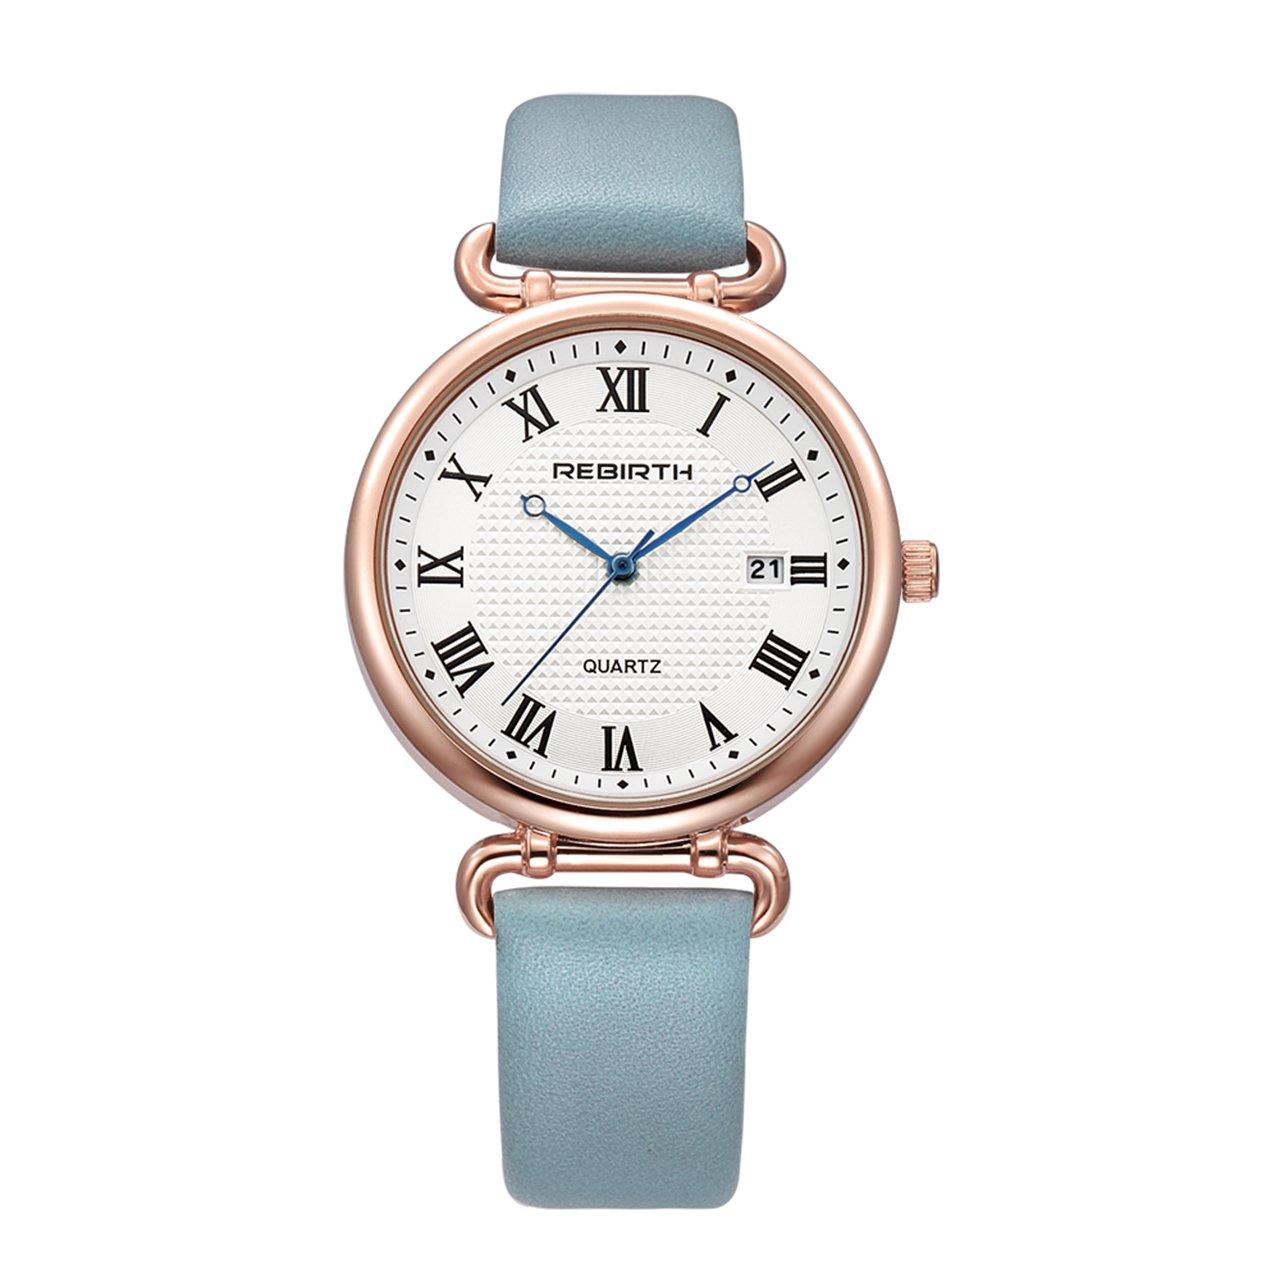 Top Plaza Women Elegant Simple Rose Gold Tone Bracelet Watch Japanese Movement Roman Numerals PU Leather Waterproof Analog Quartz Watch(Light Blue)